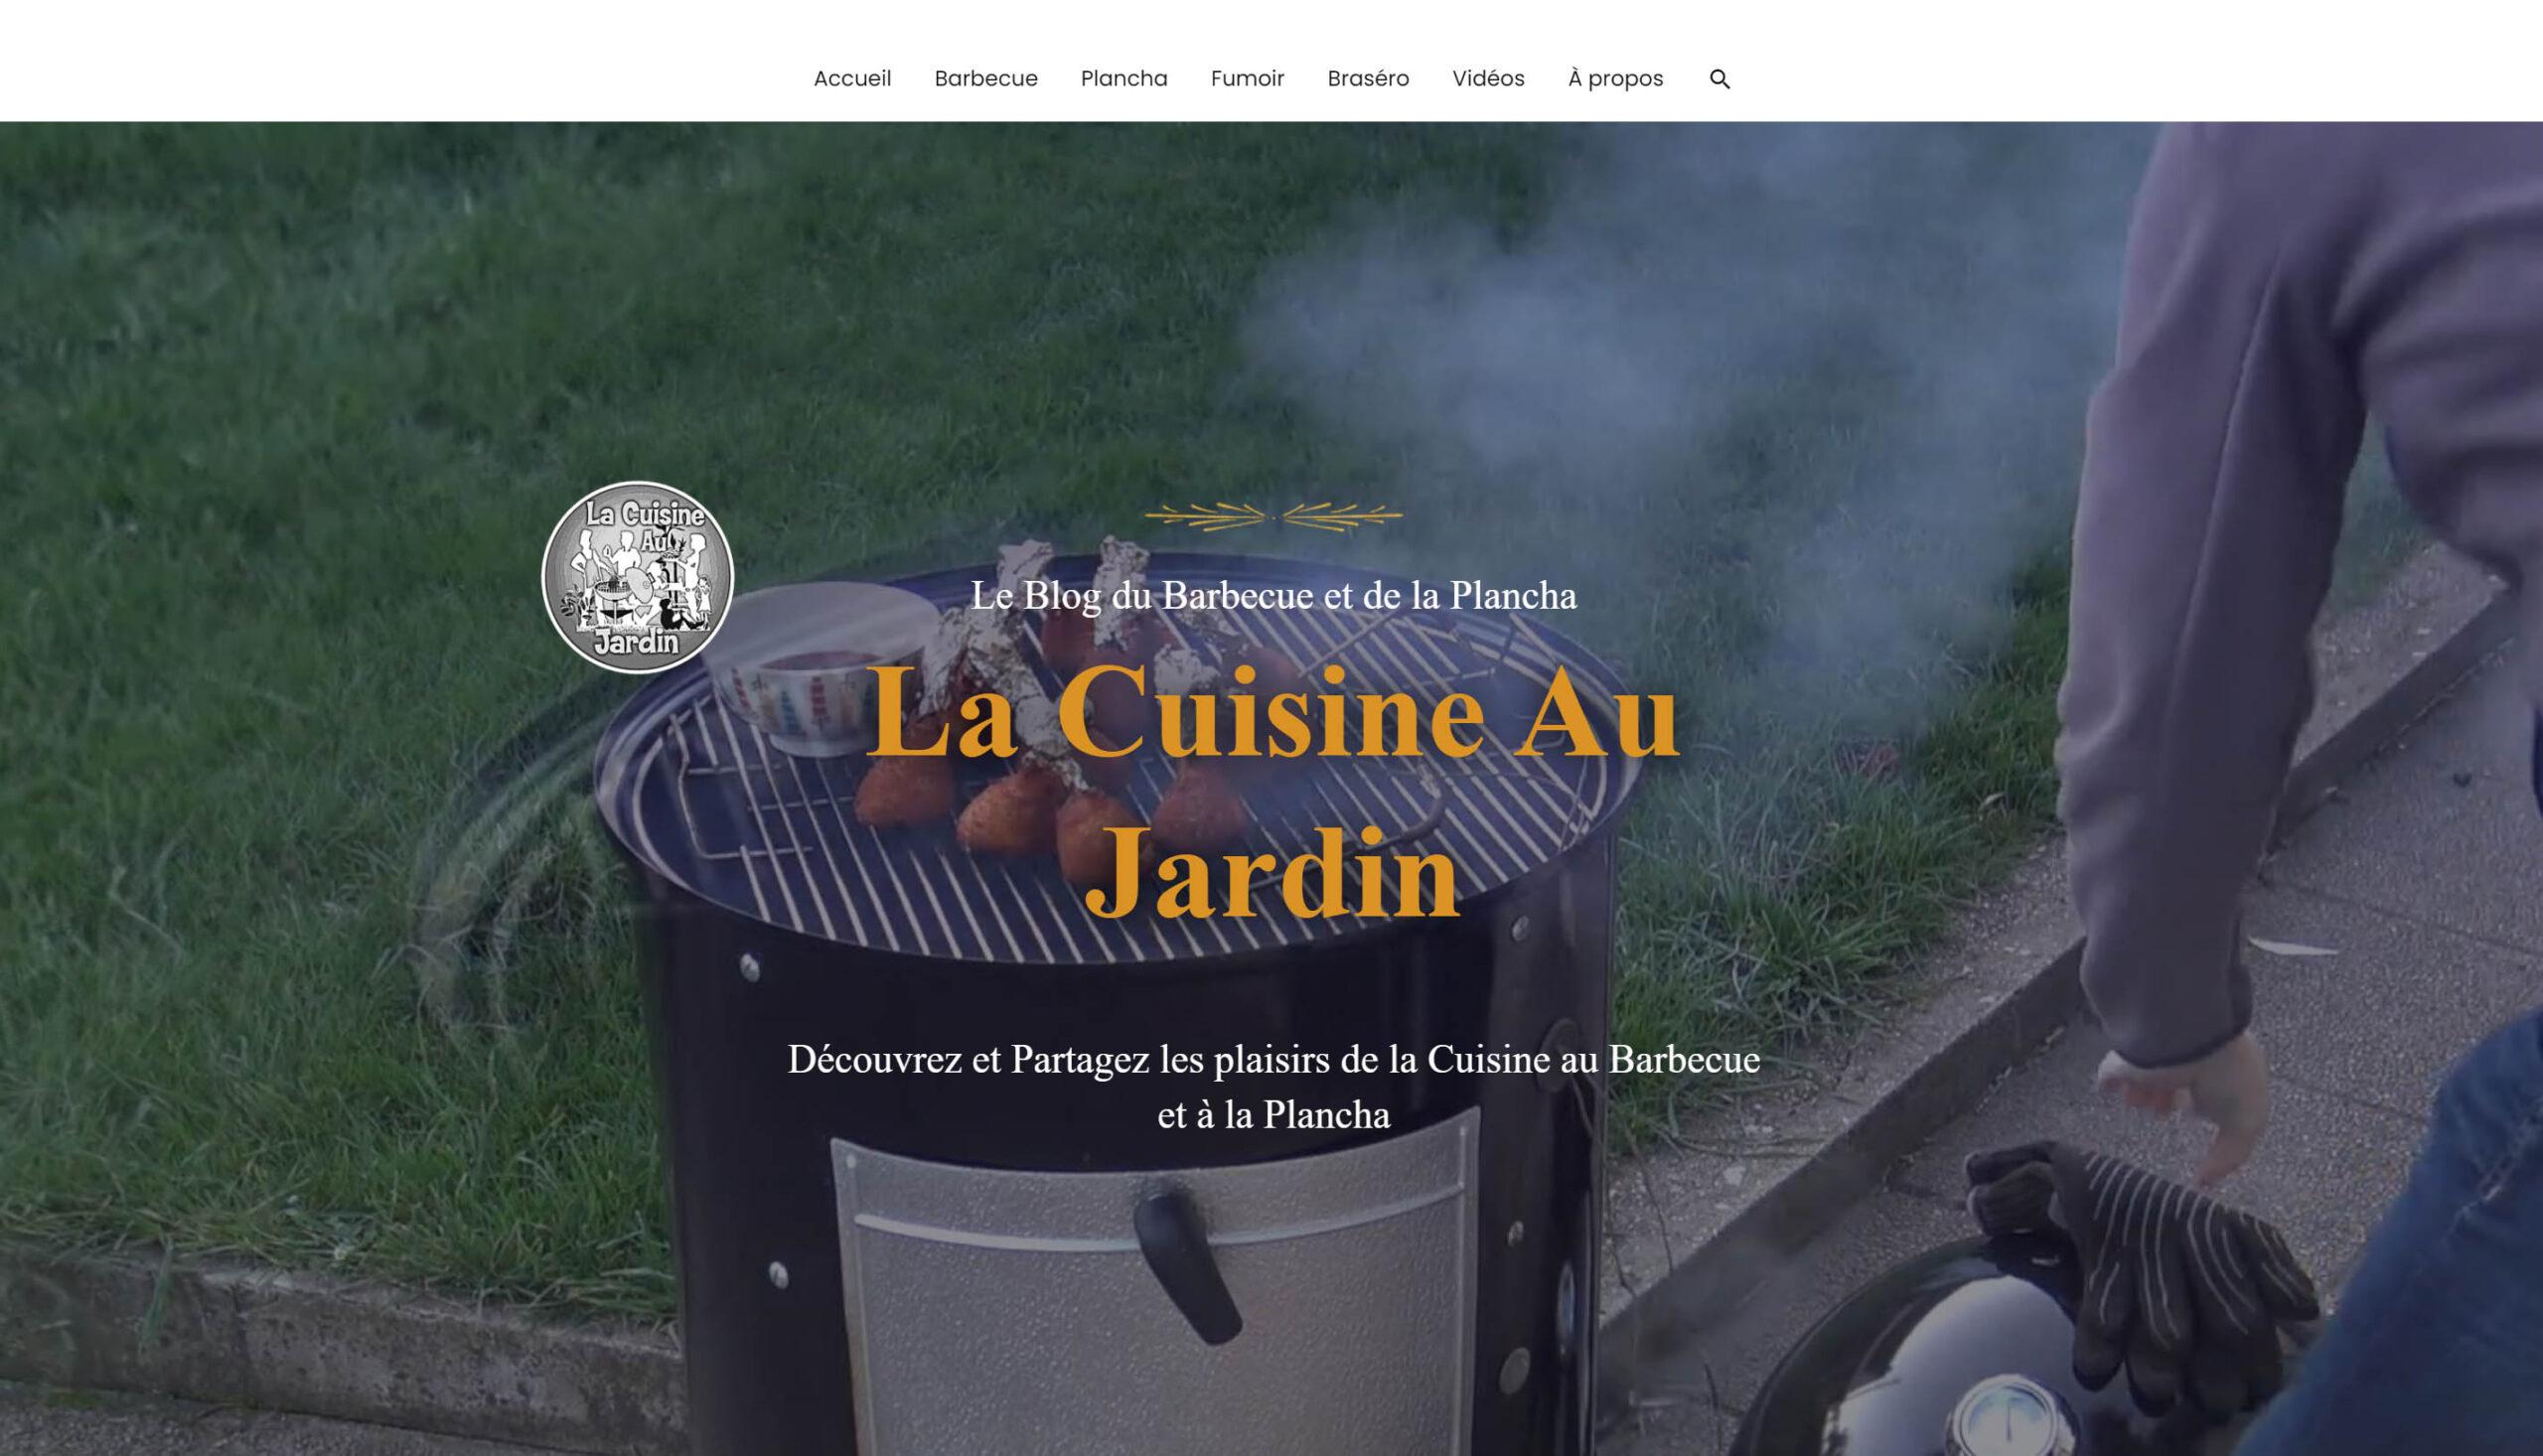 Site barbecue et plancha